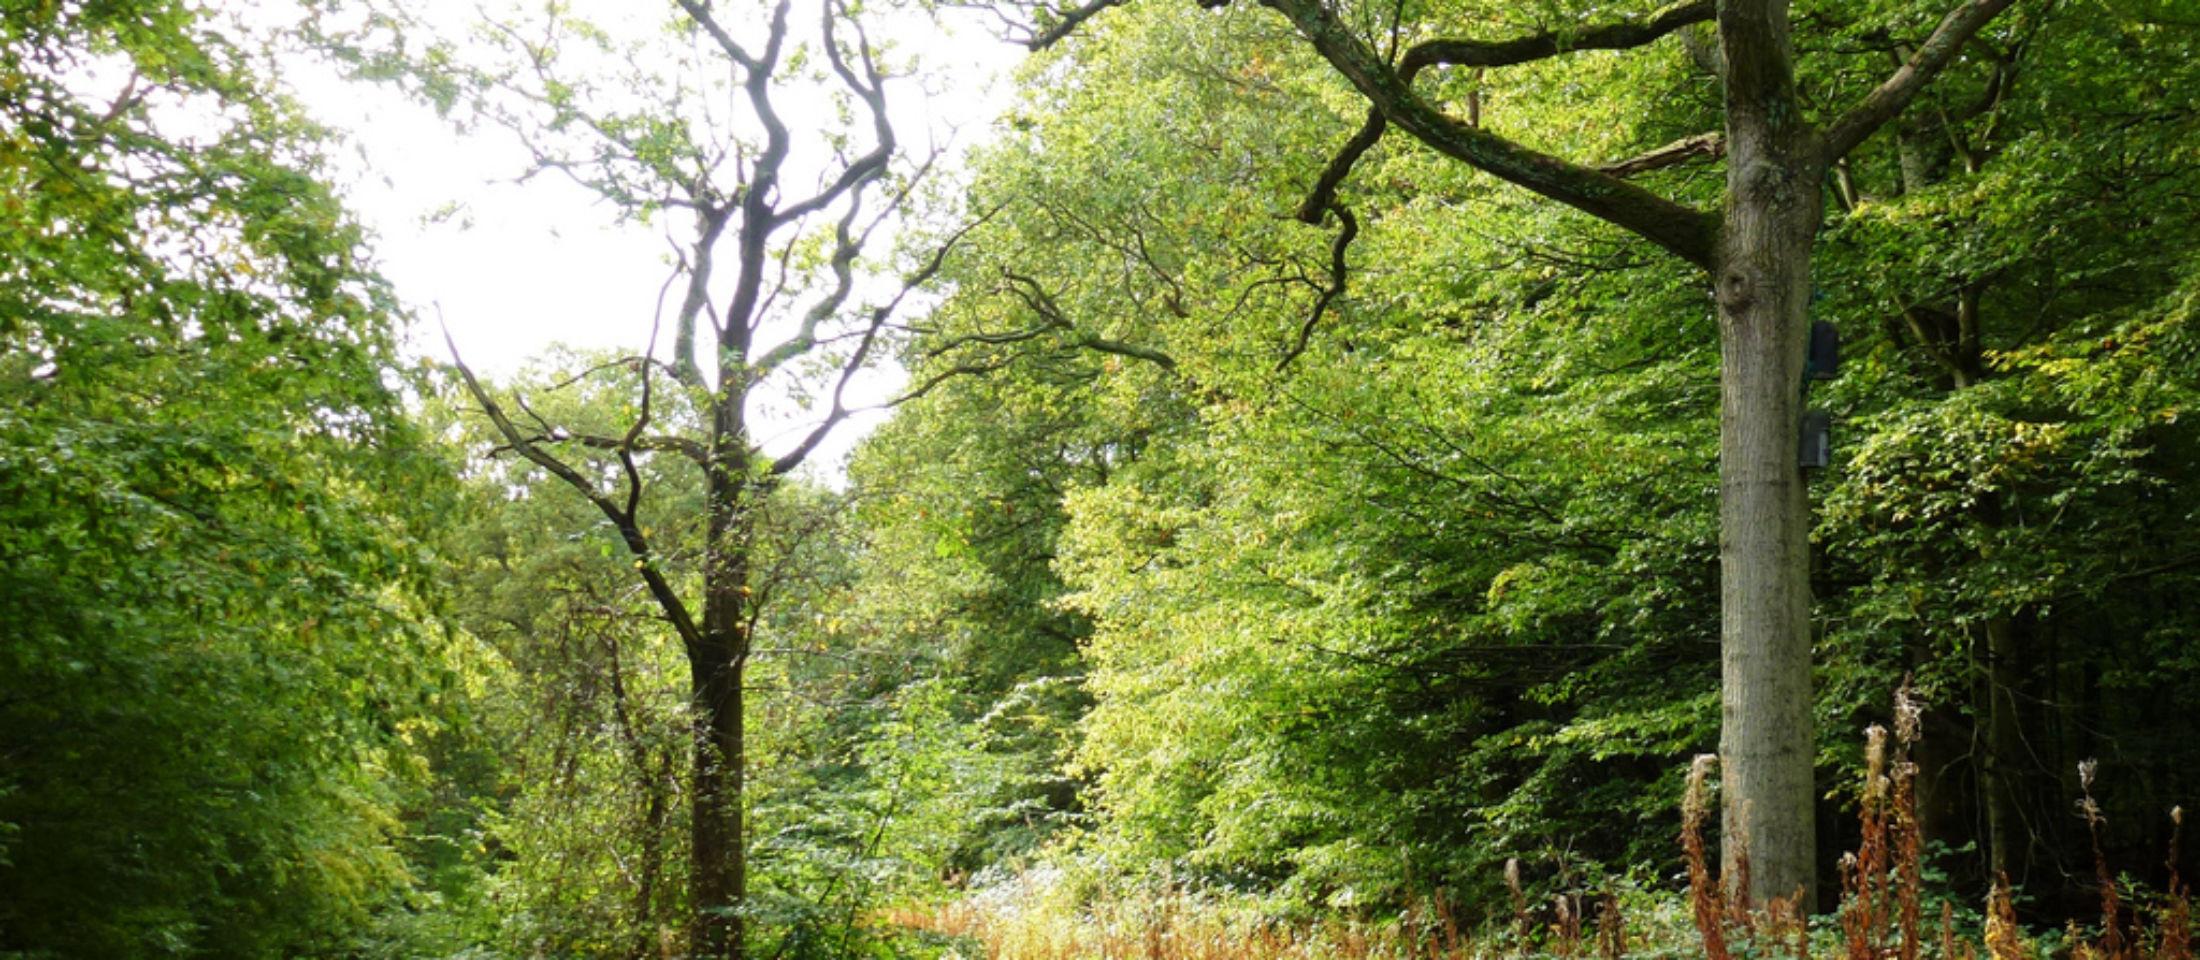 Ham Street Woods. Photo: Explore Kent